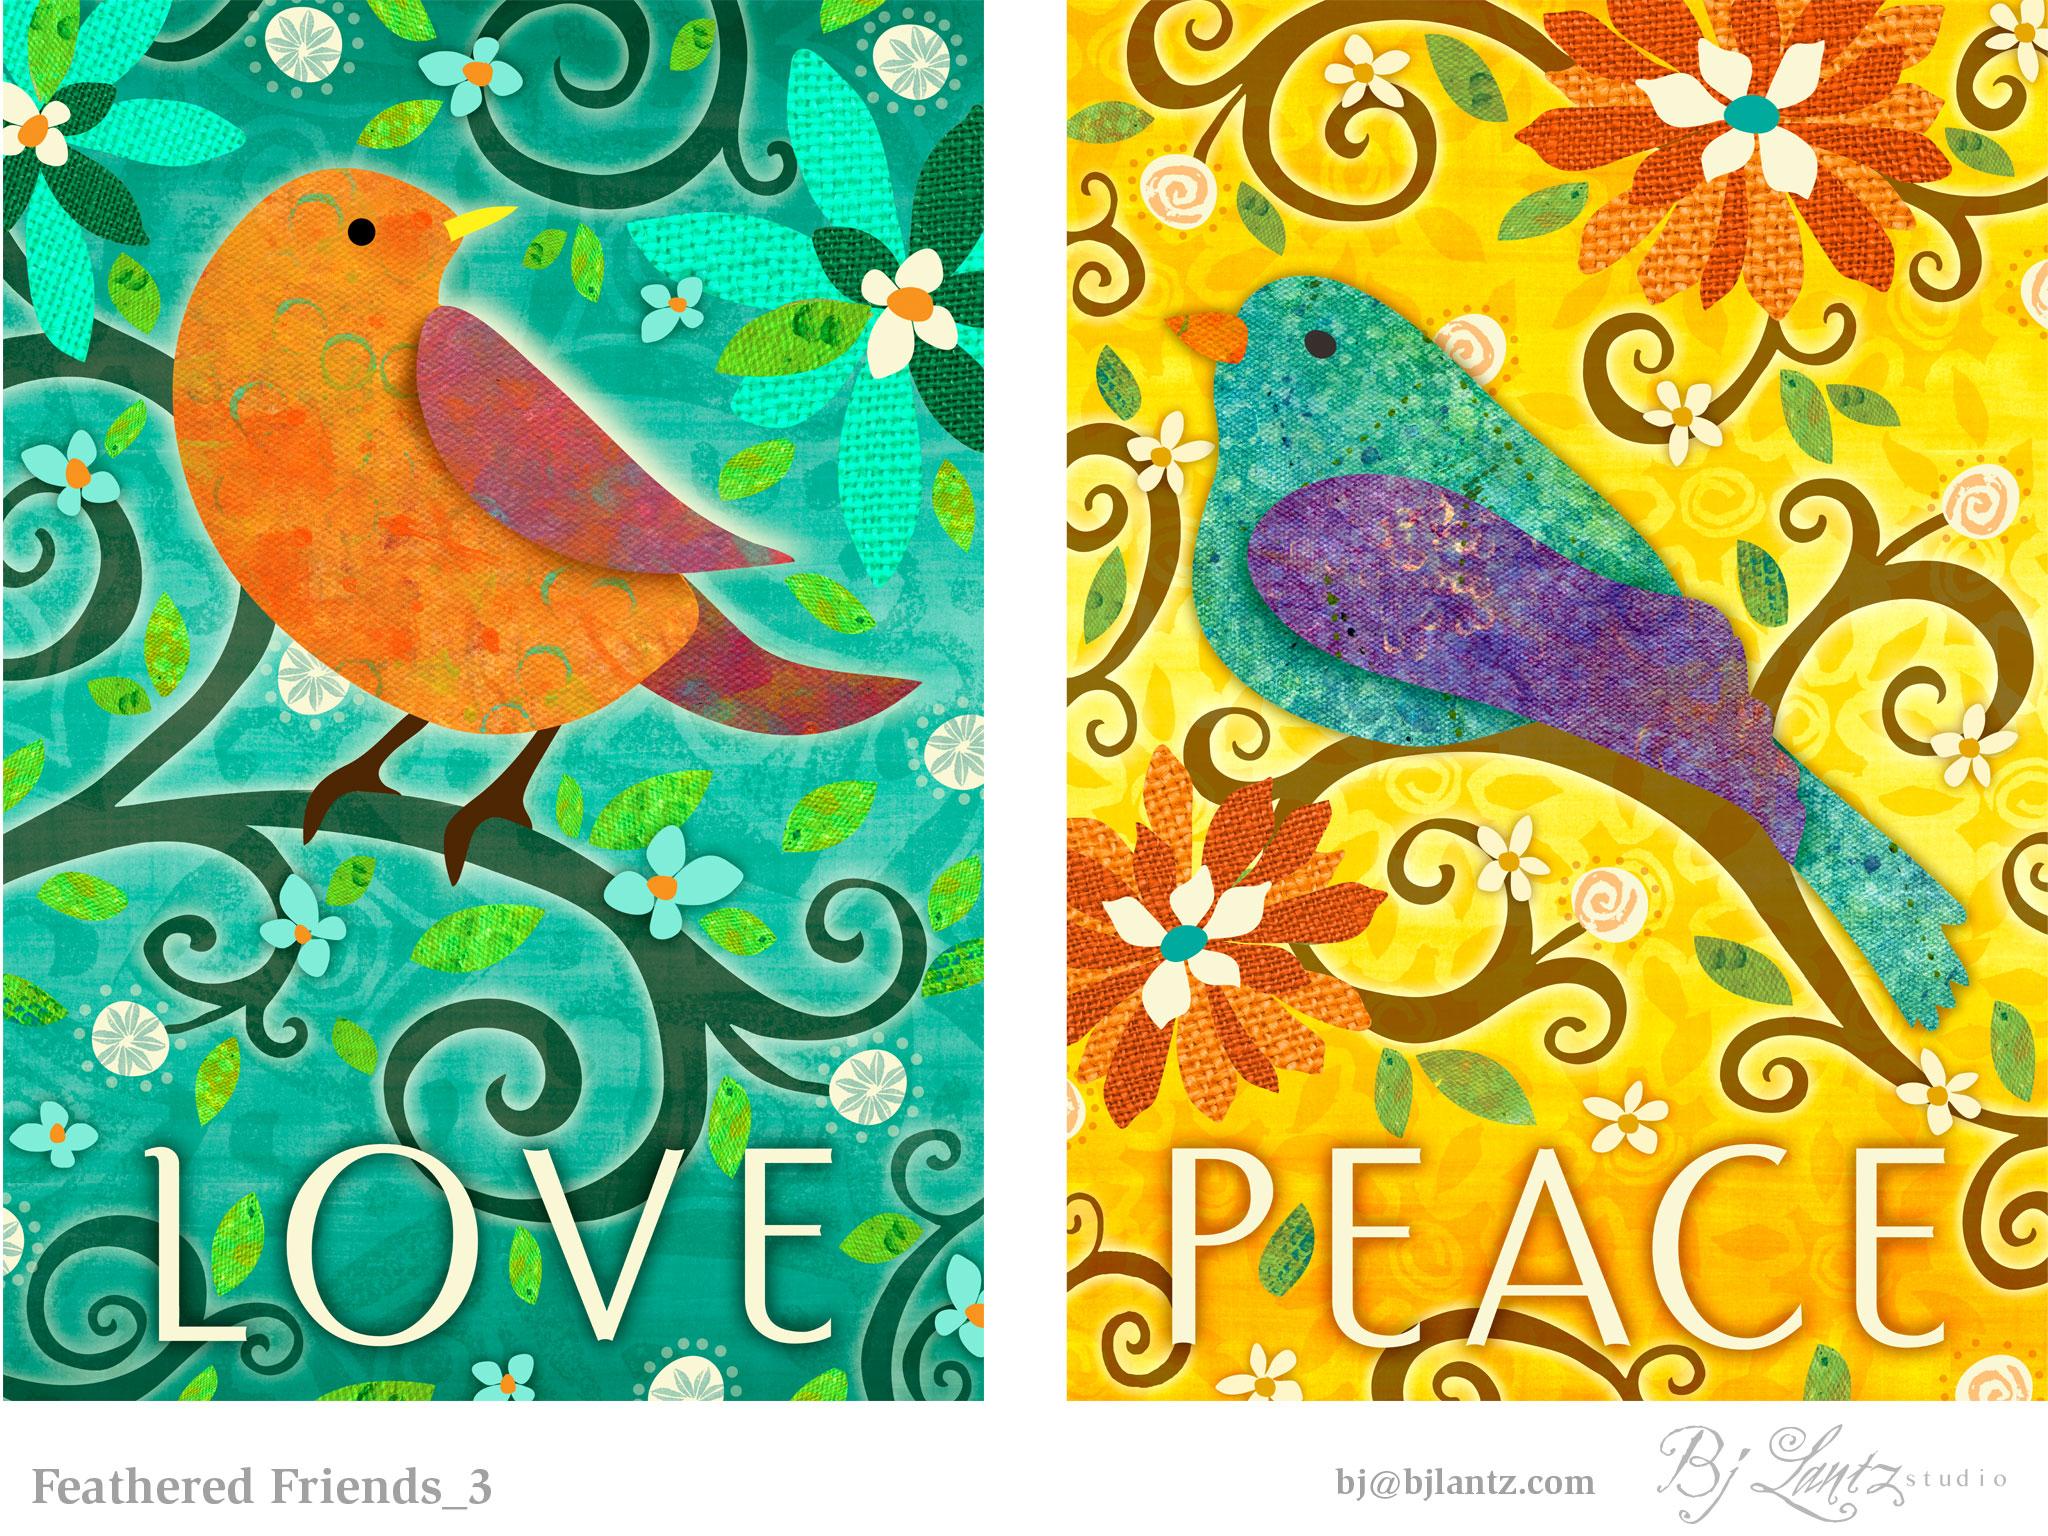 FeatheredFriends_3_BJLantz_portfolio.jpg